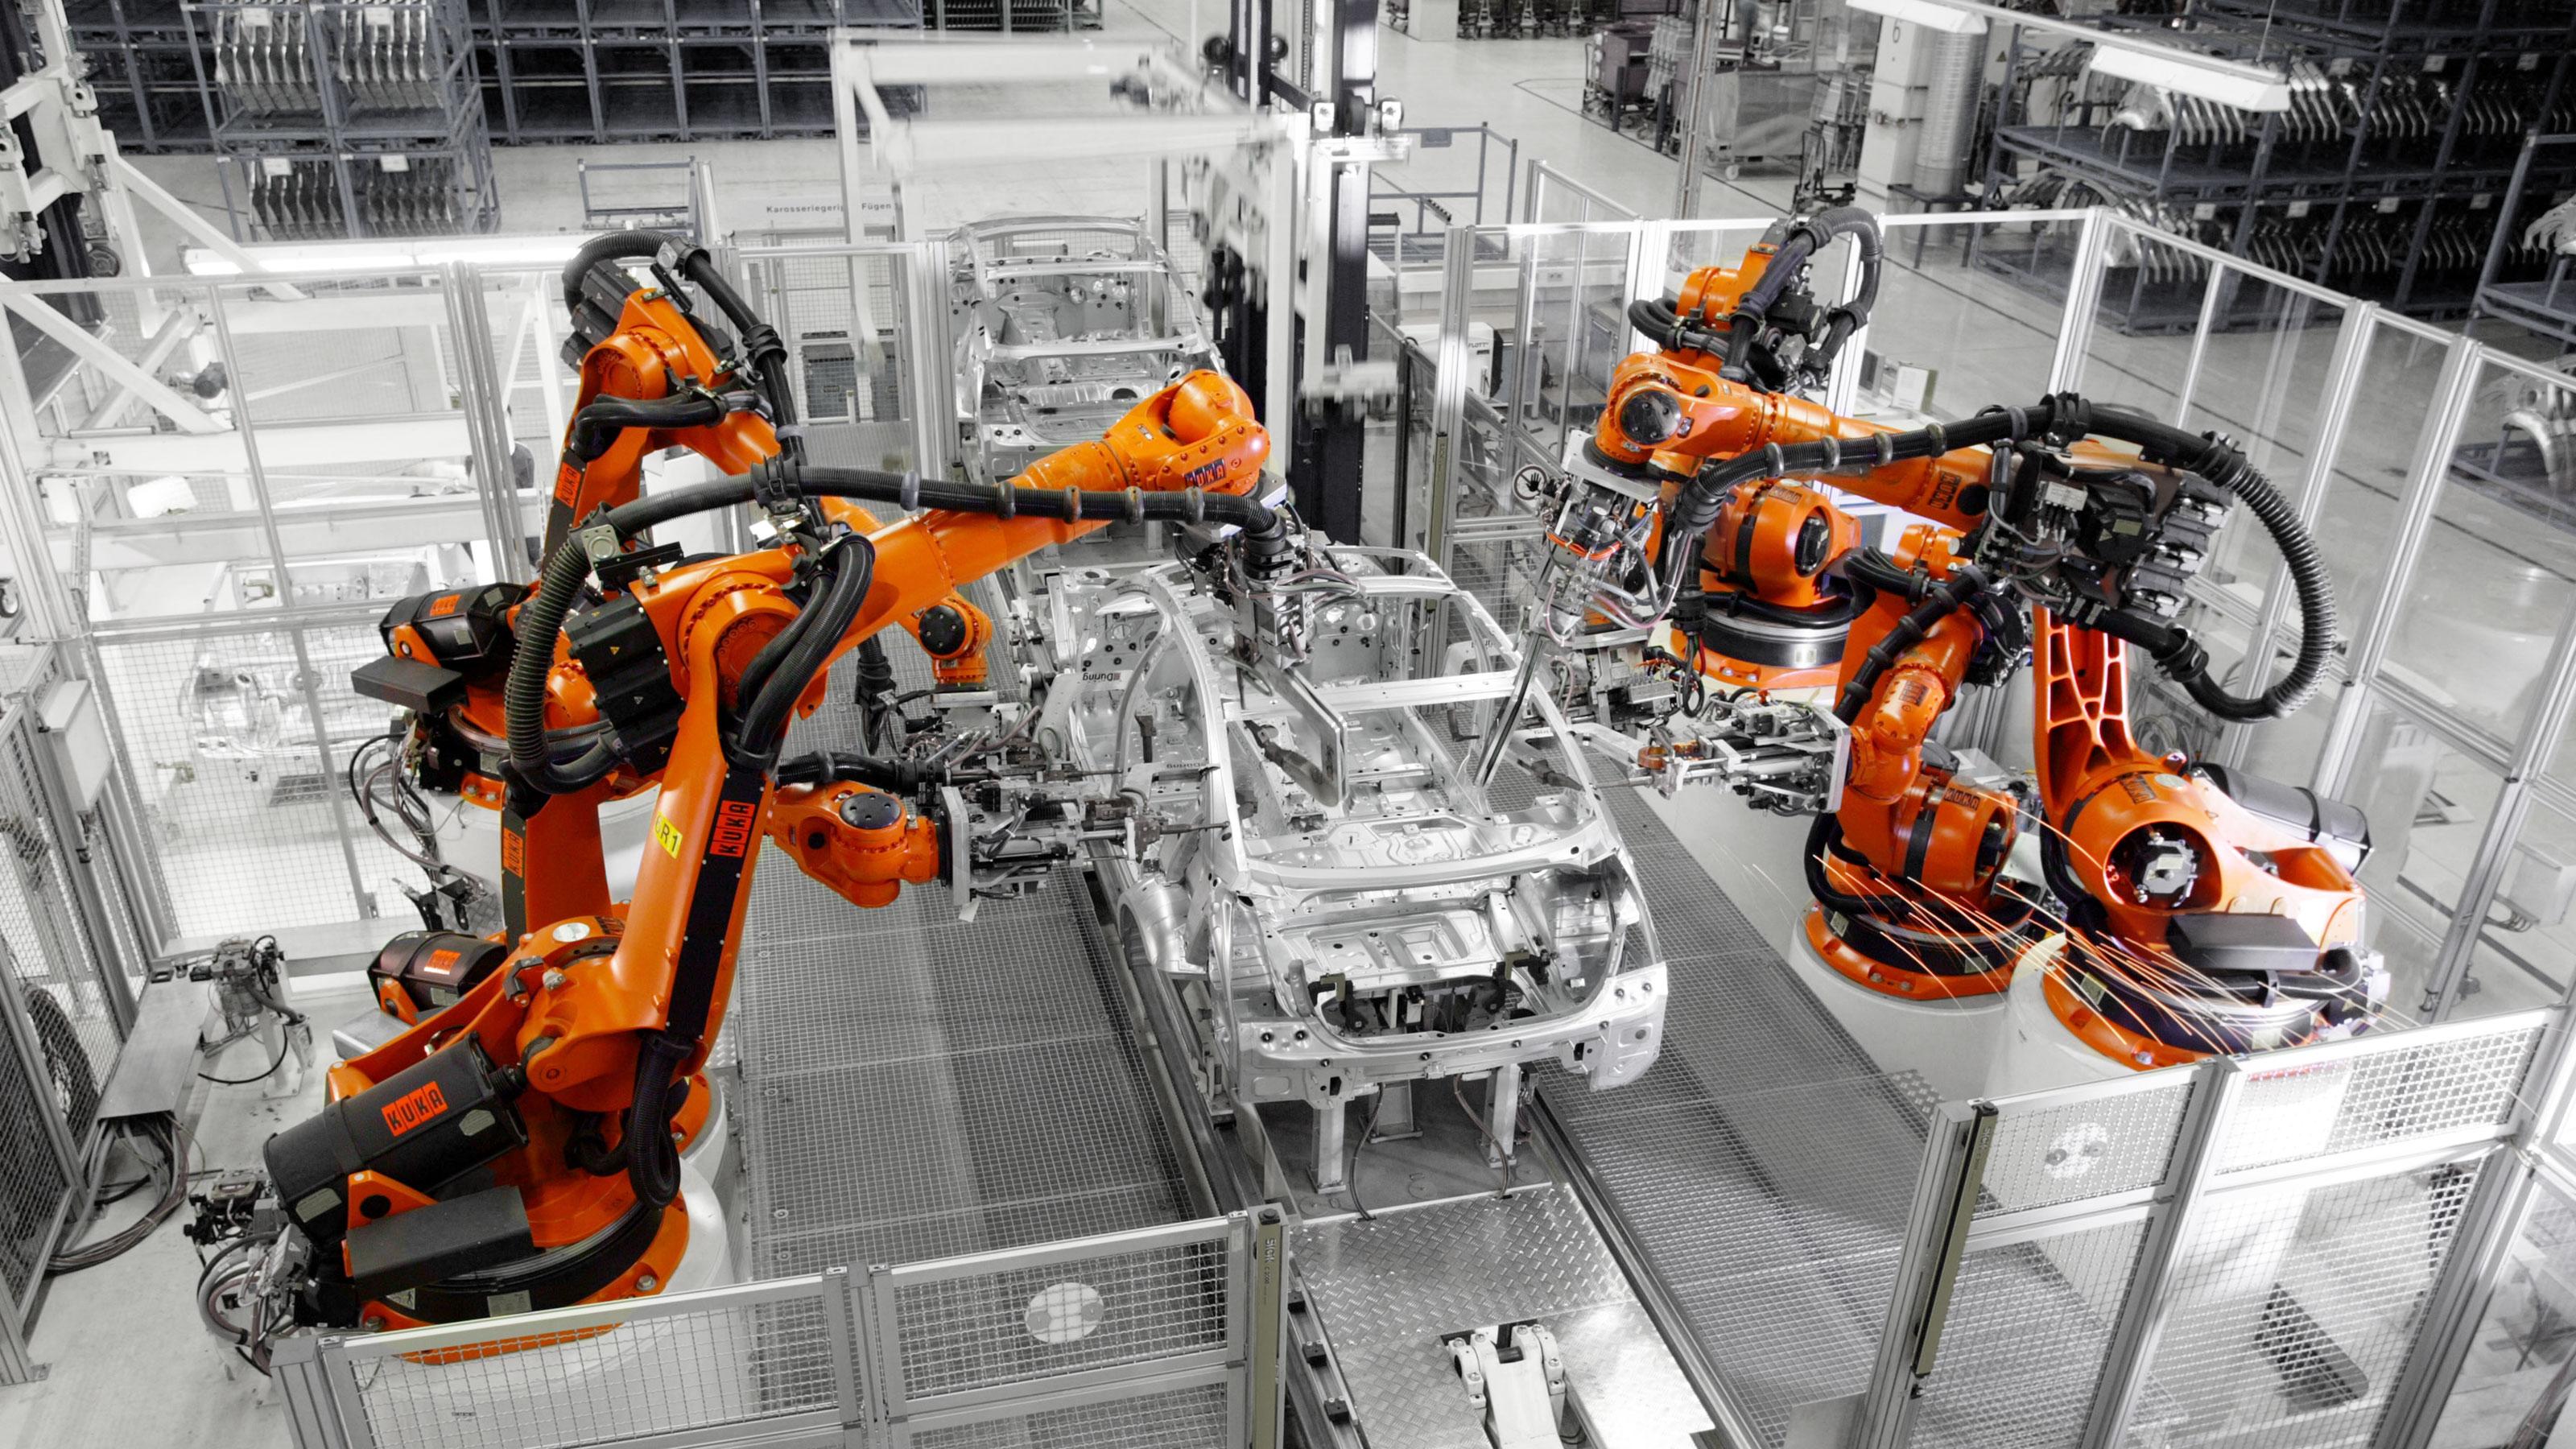 https://itsupplychain.com/wp-content/uploads/2018/10/Kuka-Division-Automobilindustrie-Automatisierung.jpg